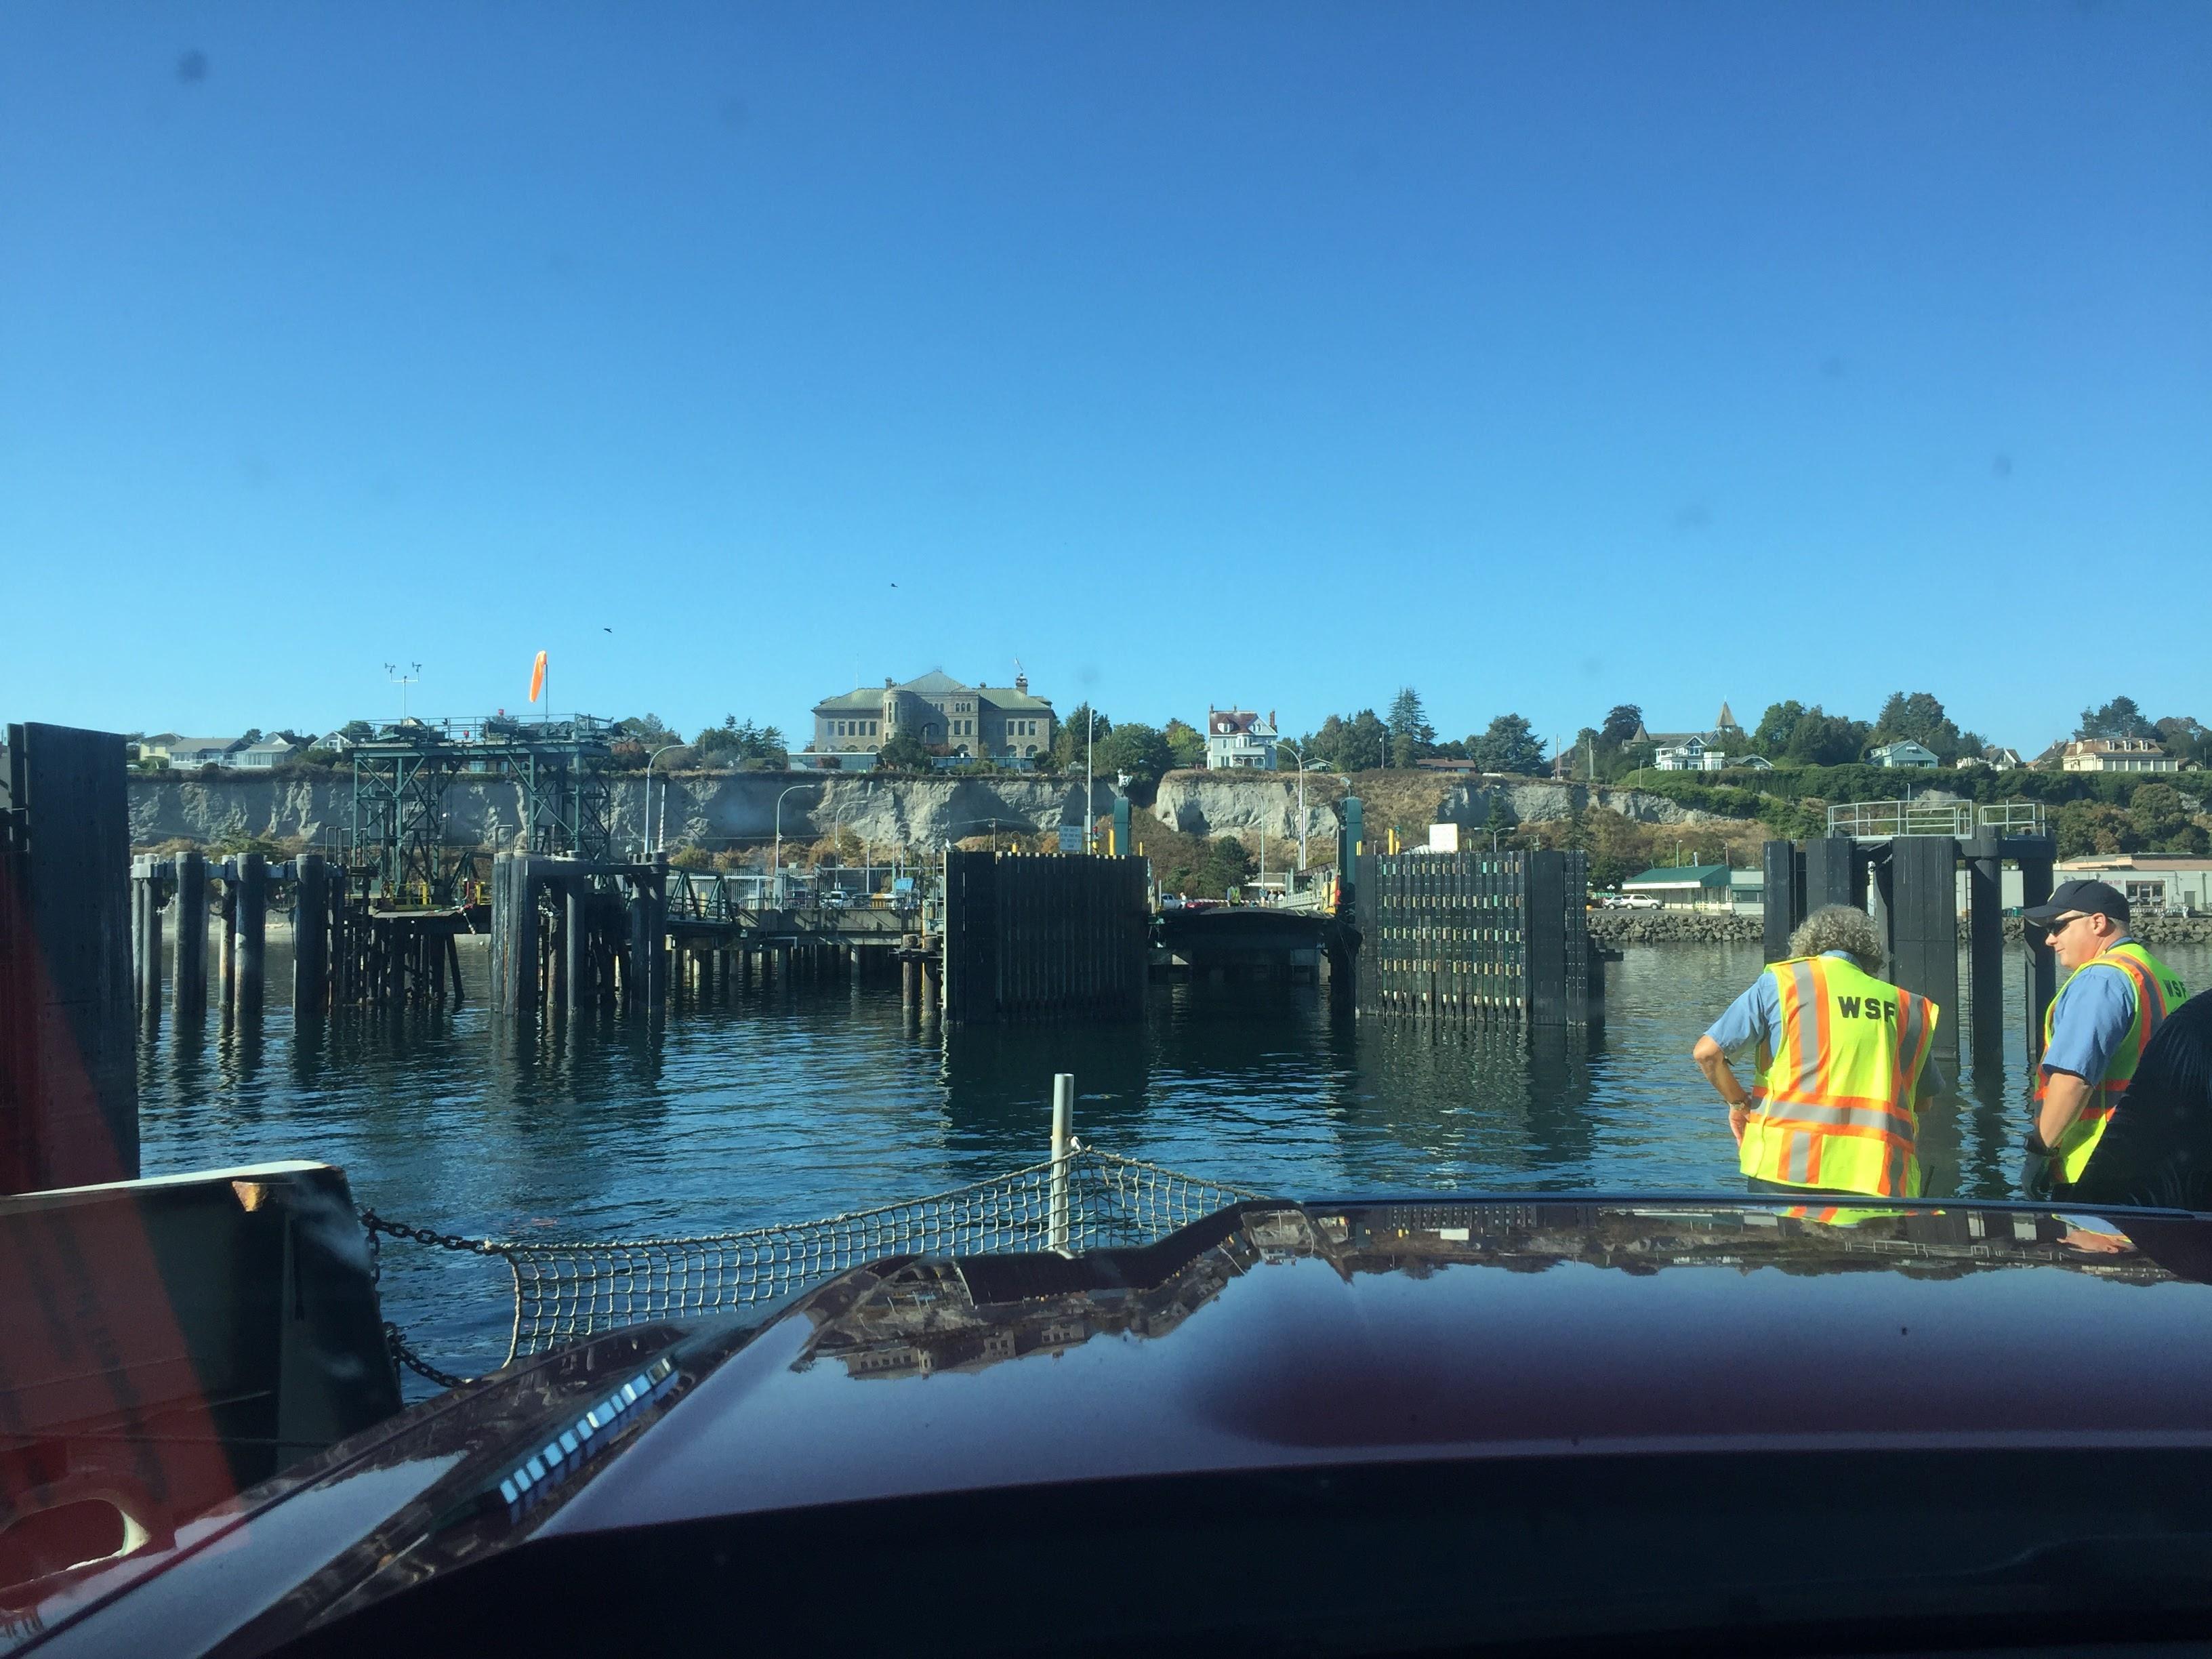 2017-09-28 Washington 01 Ferry 11